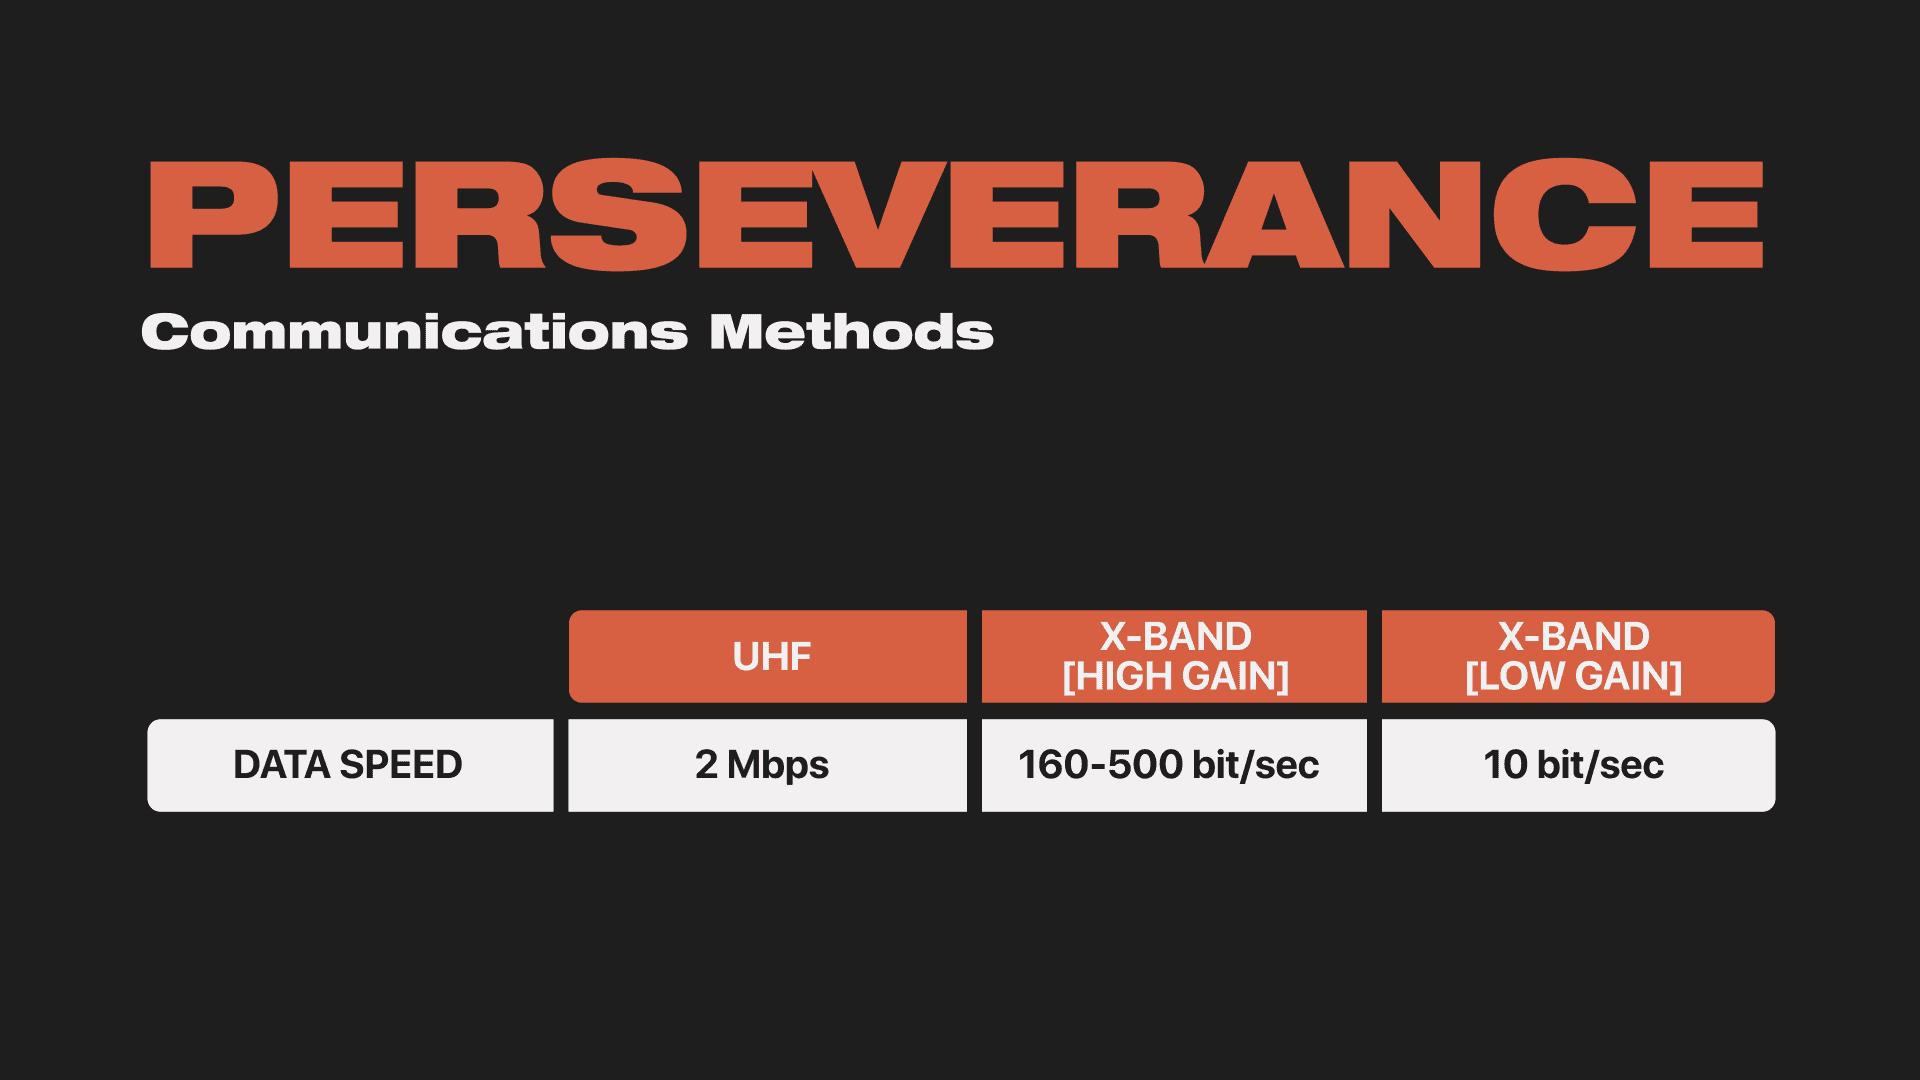 Perseverance Communication Methods